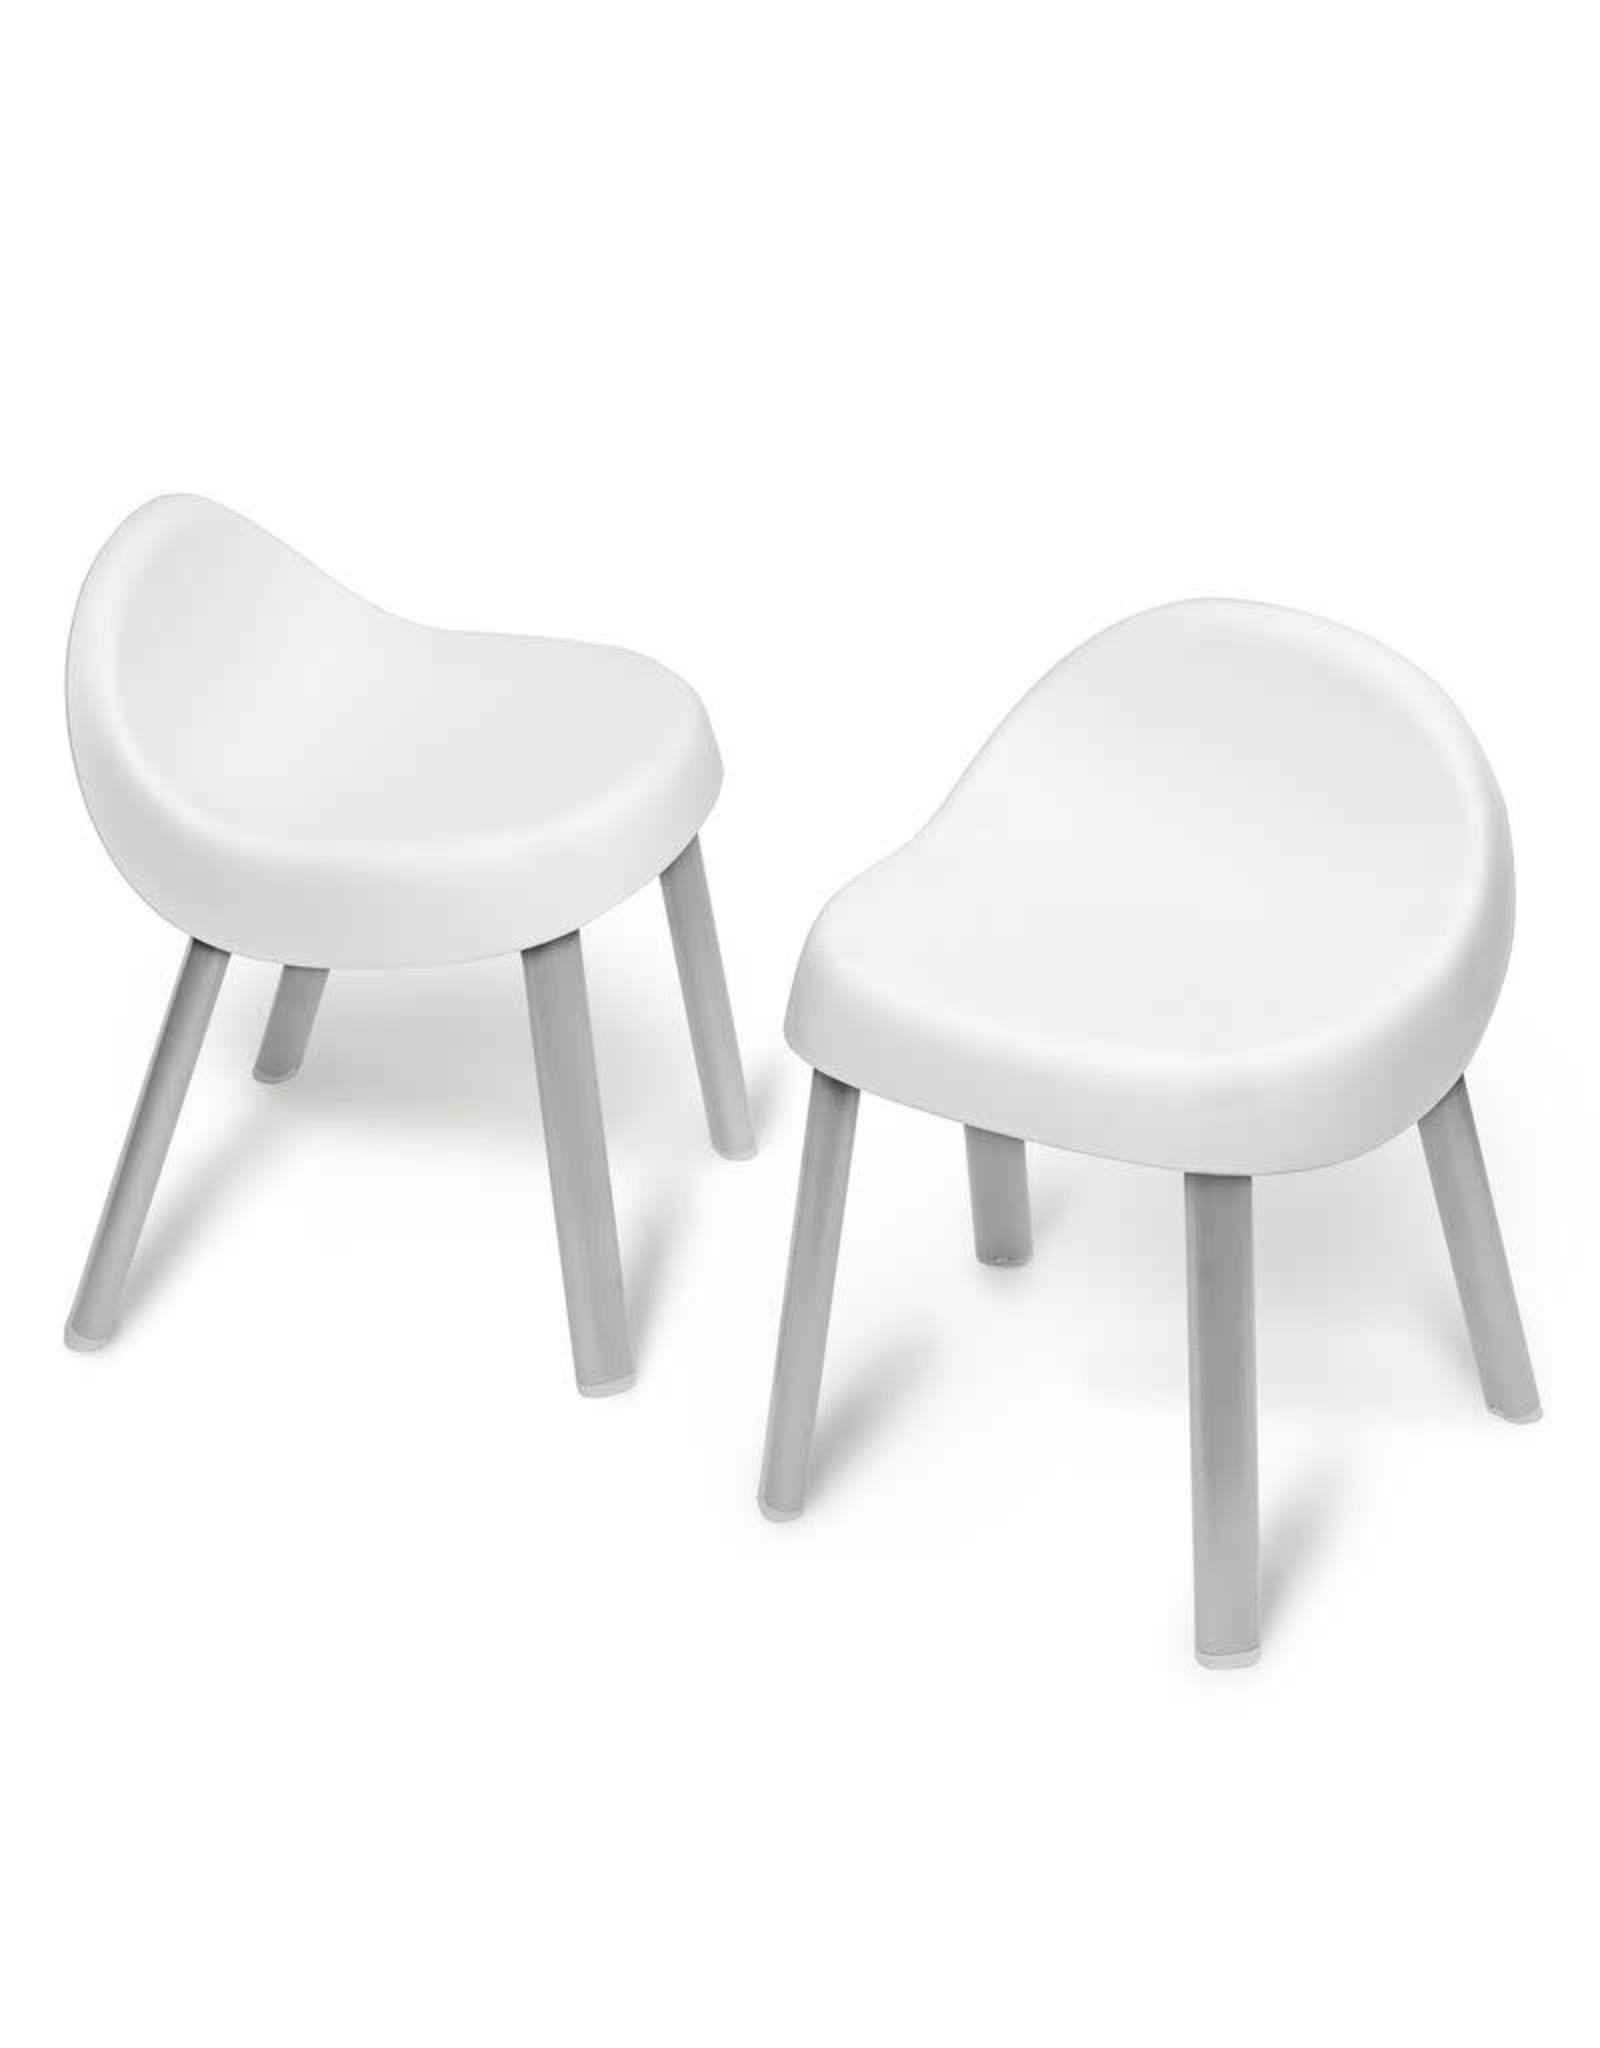 Skip Hop Kids Chairs (set of 2)